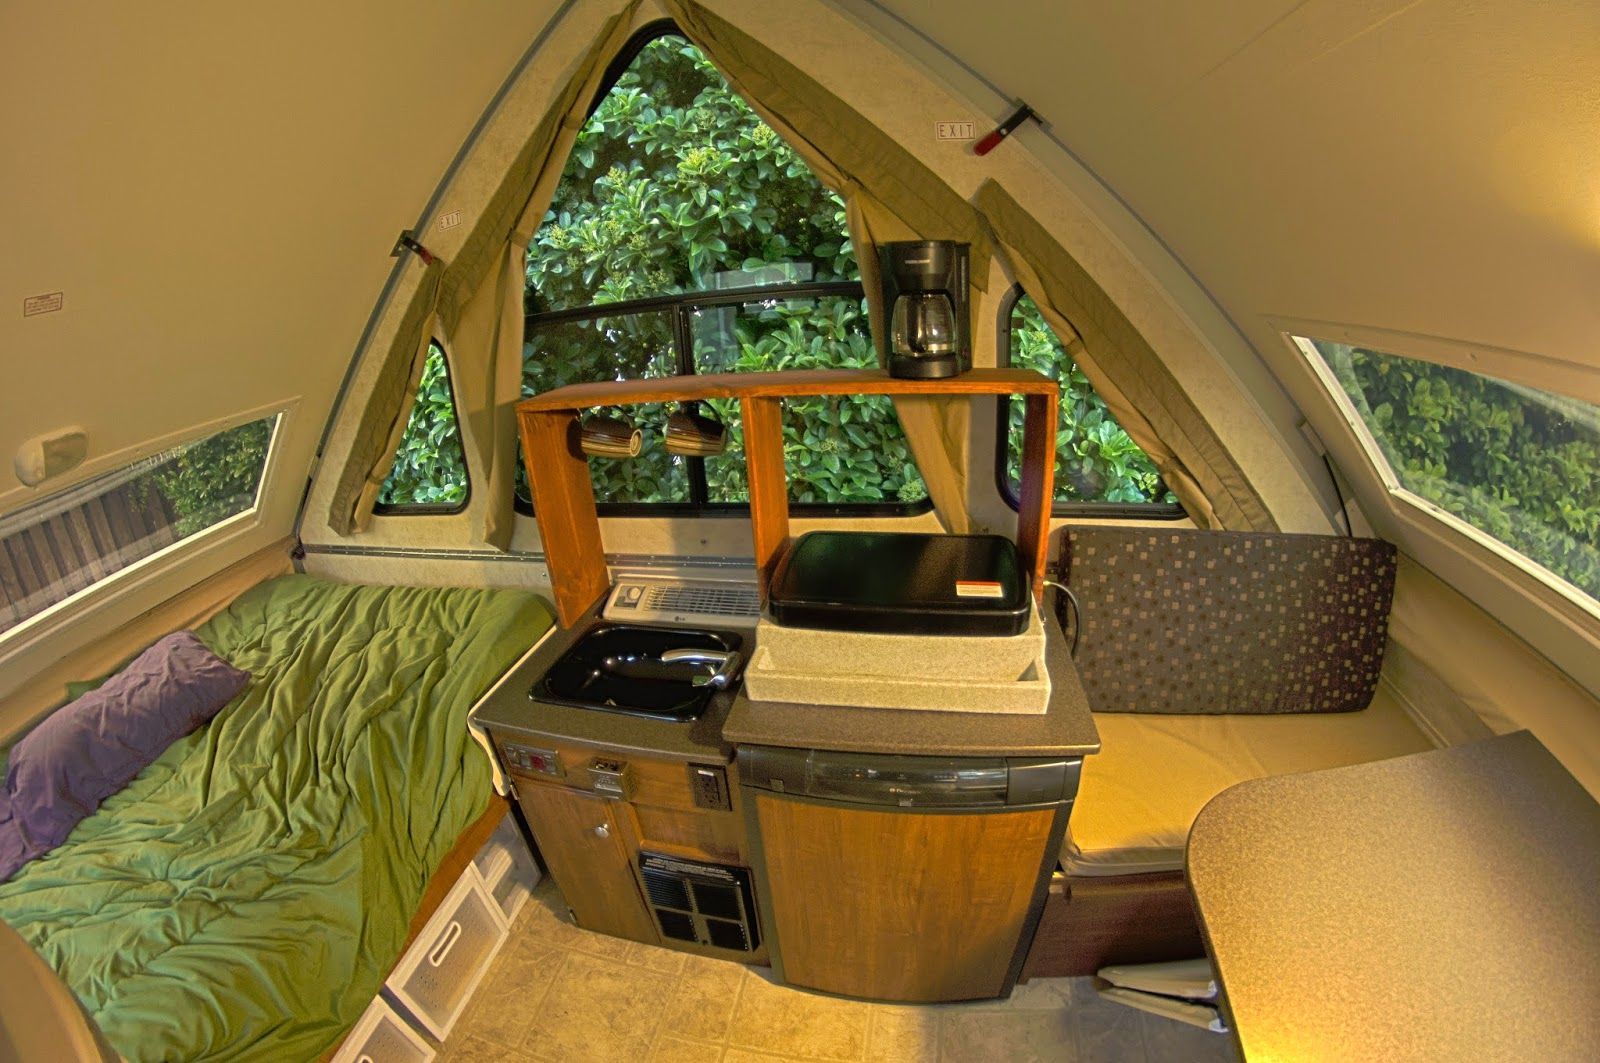 34+ Aliner pop up camper ideas